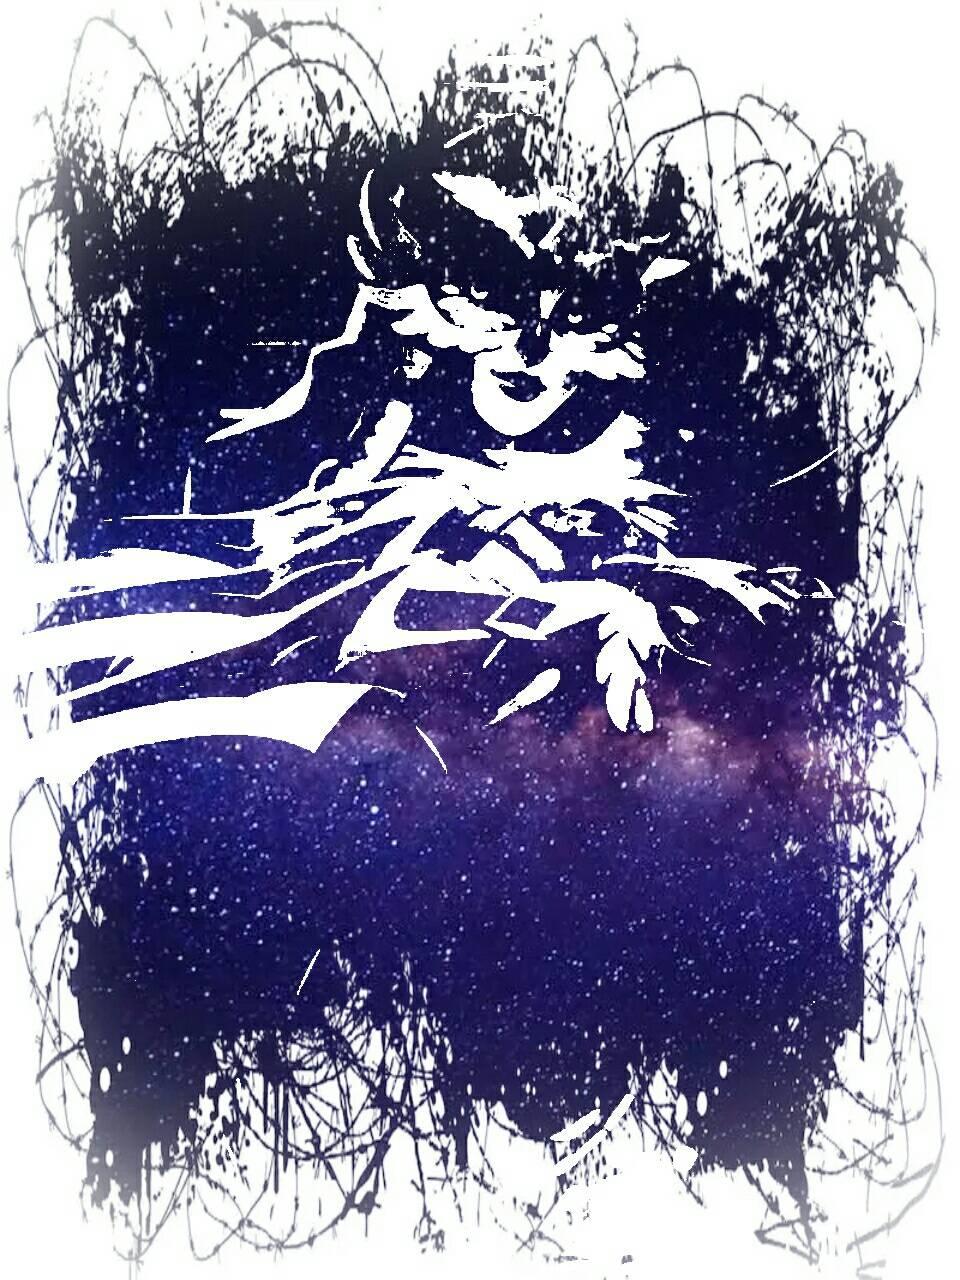 Natalia MLBB Wallpaper By SASAMYRA B7 Free On ZEDGE™